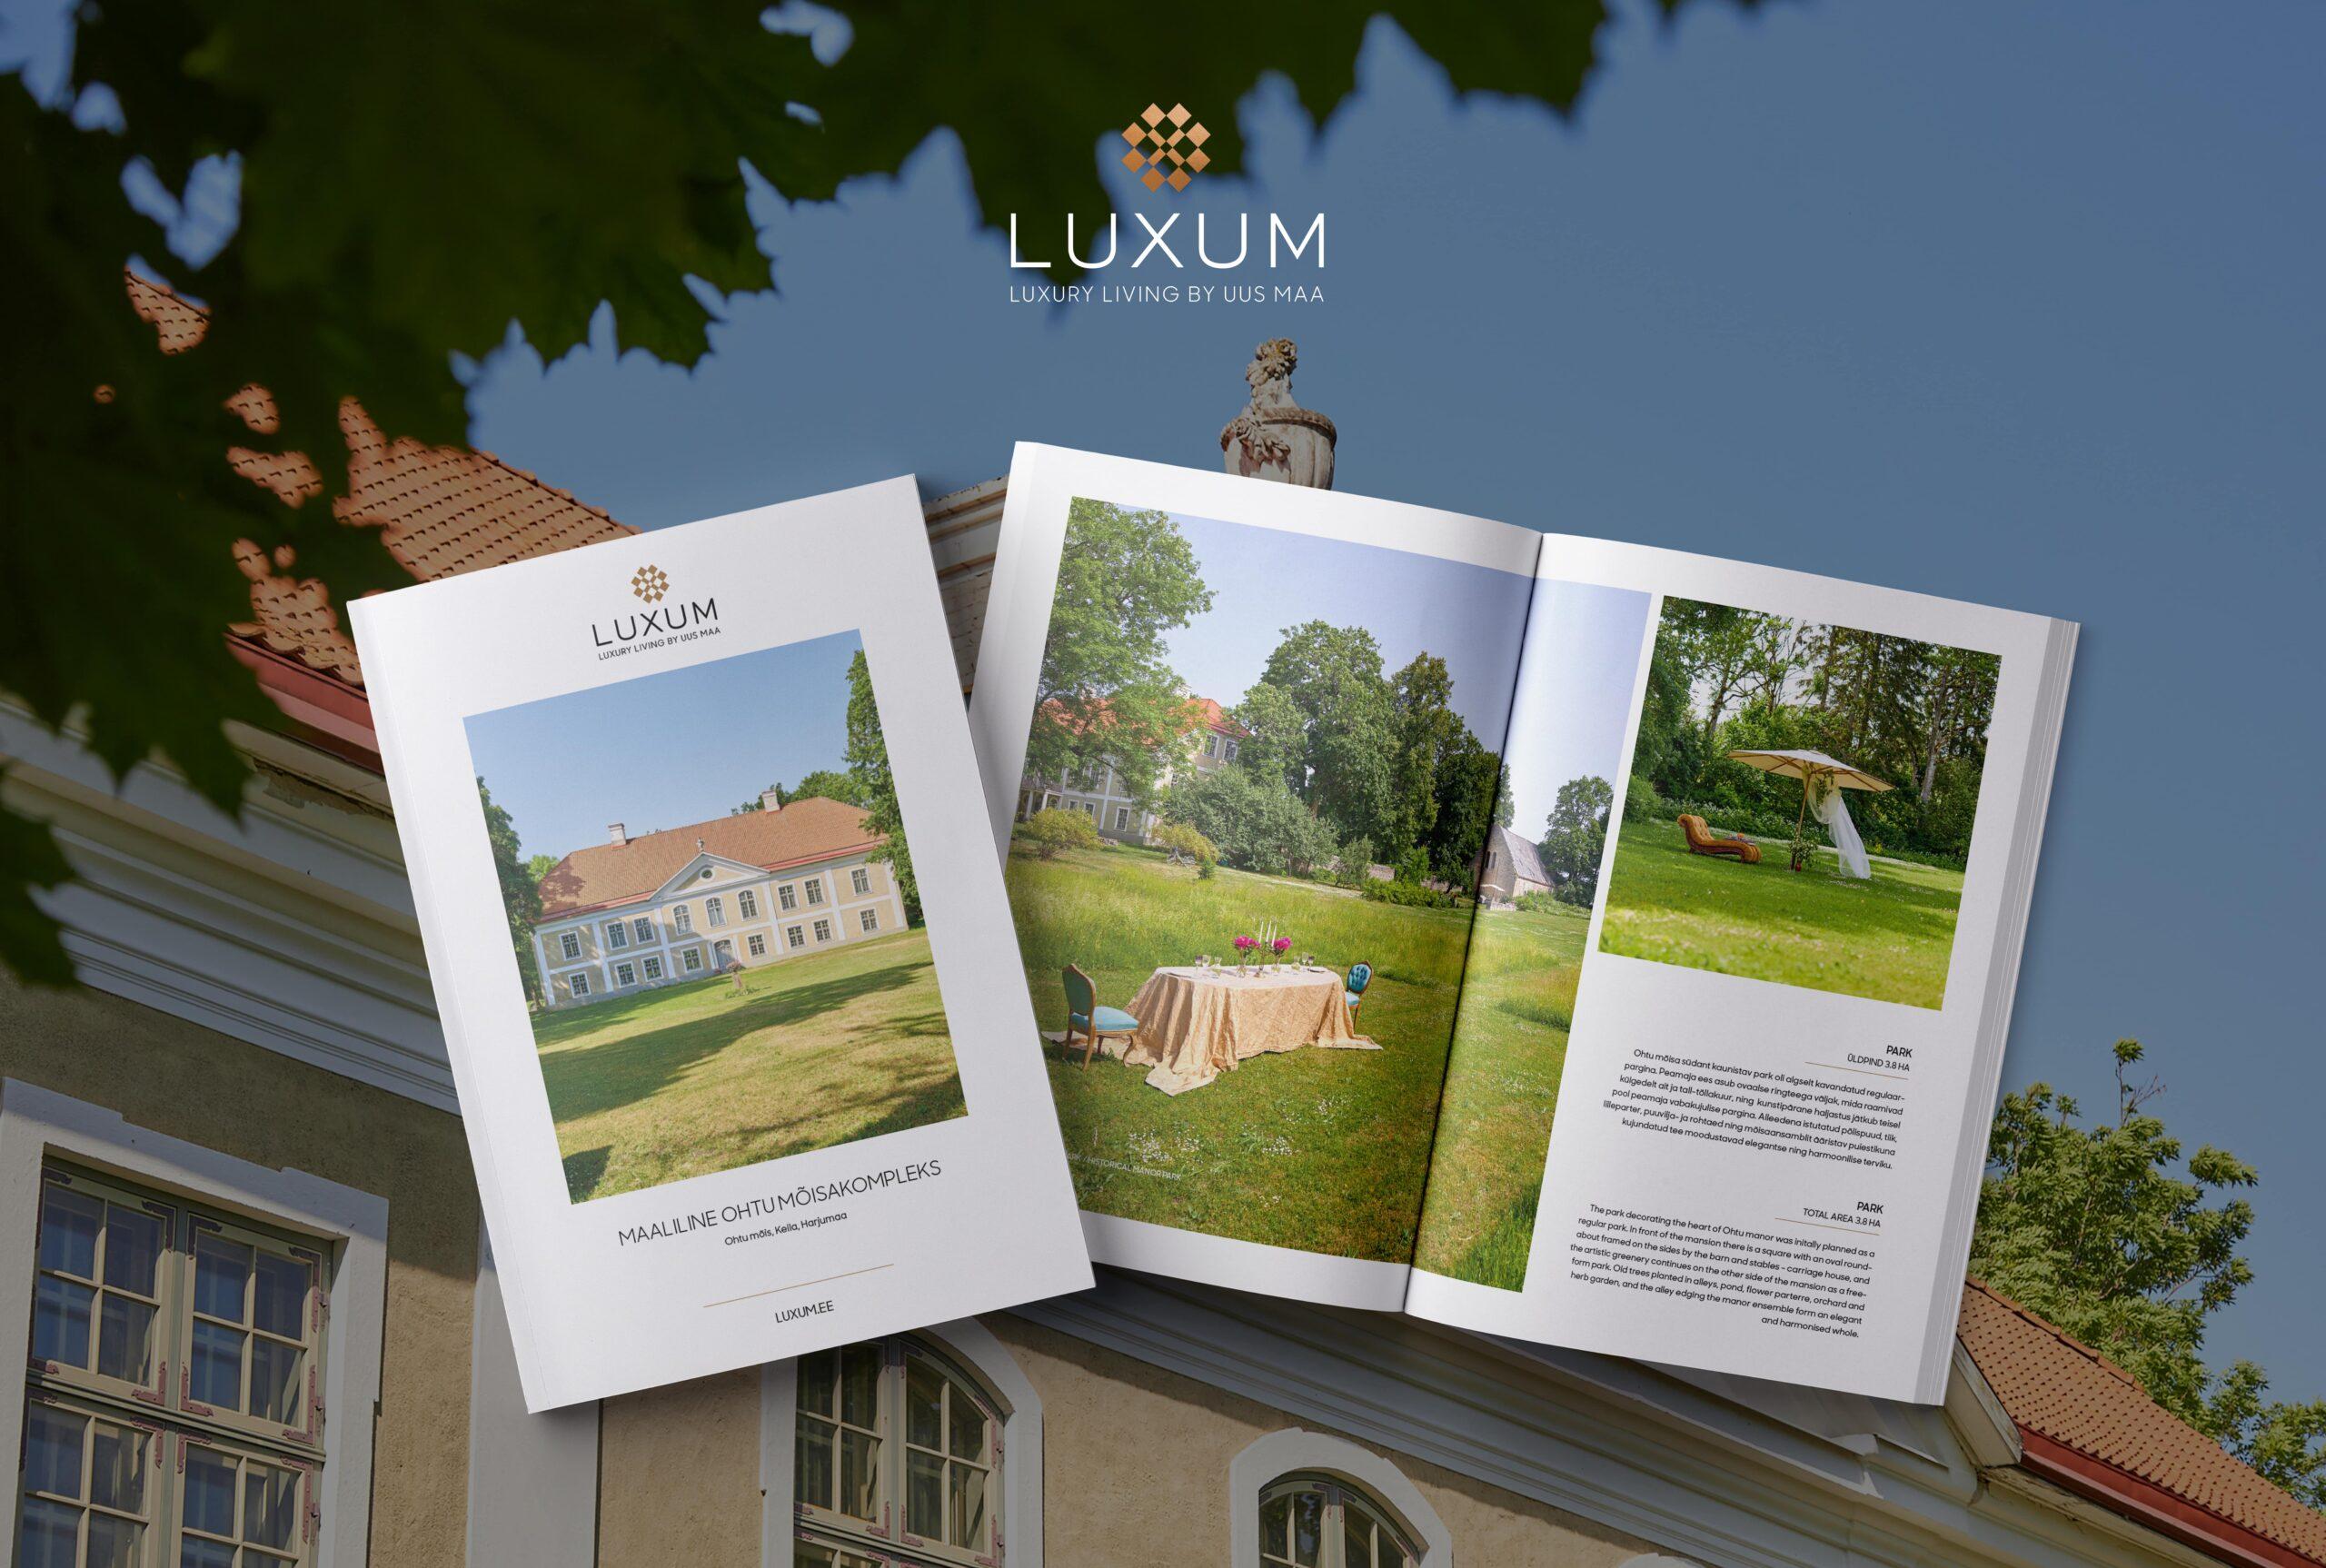 luxum-luksuskinnisvara